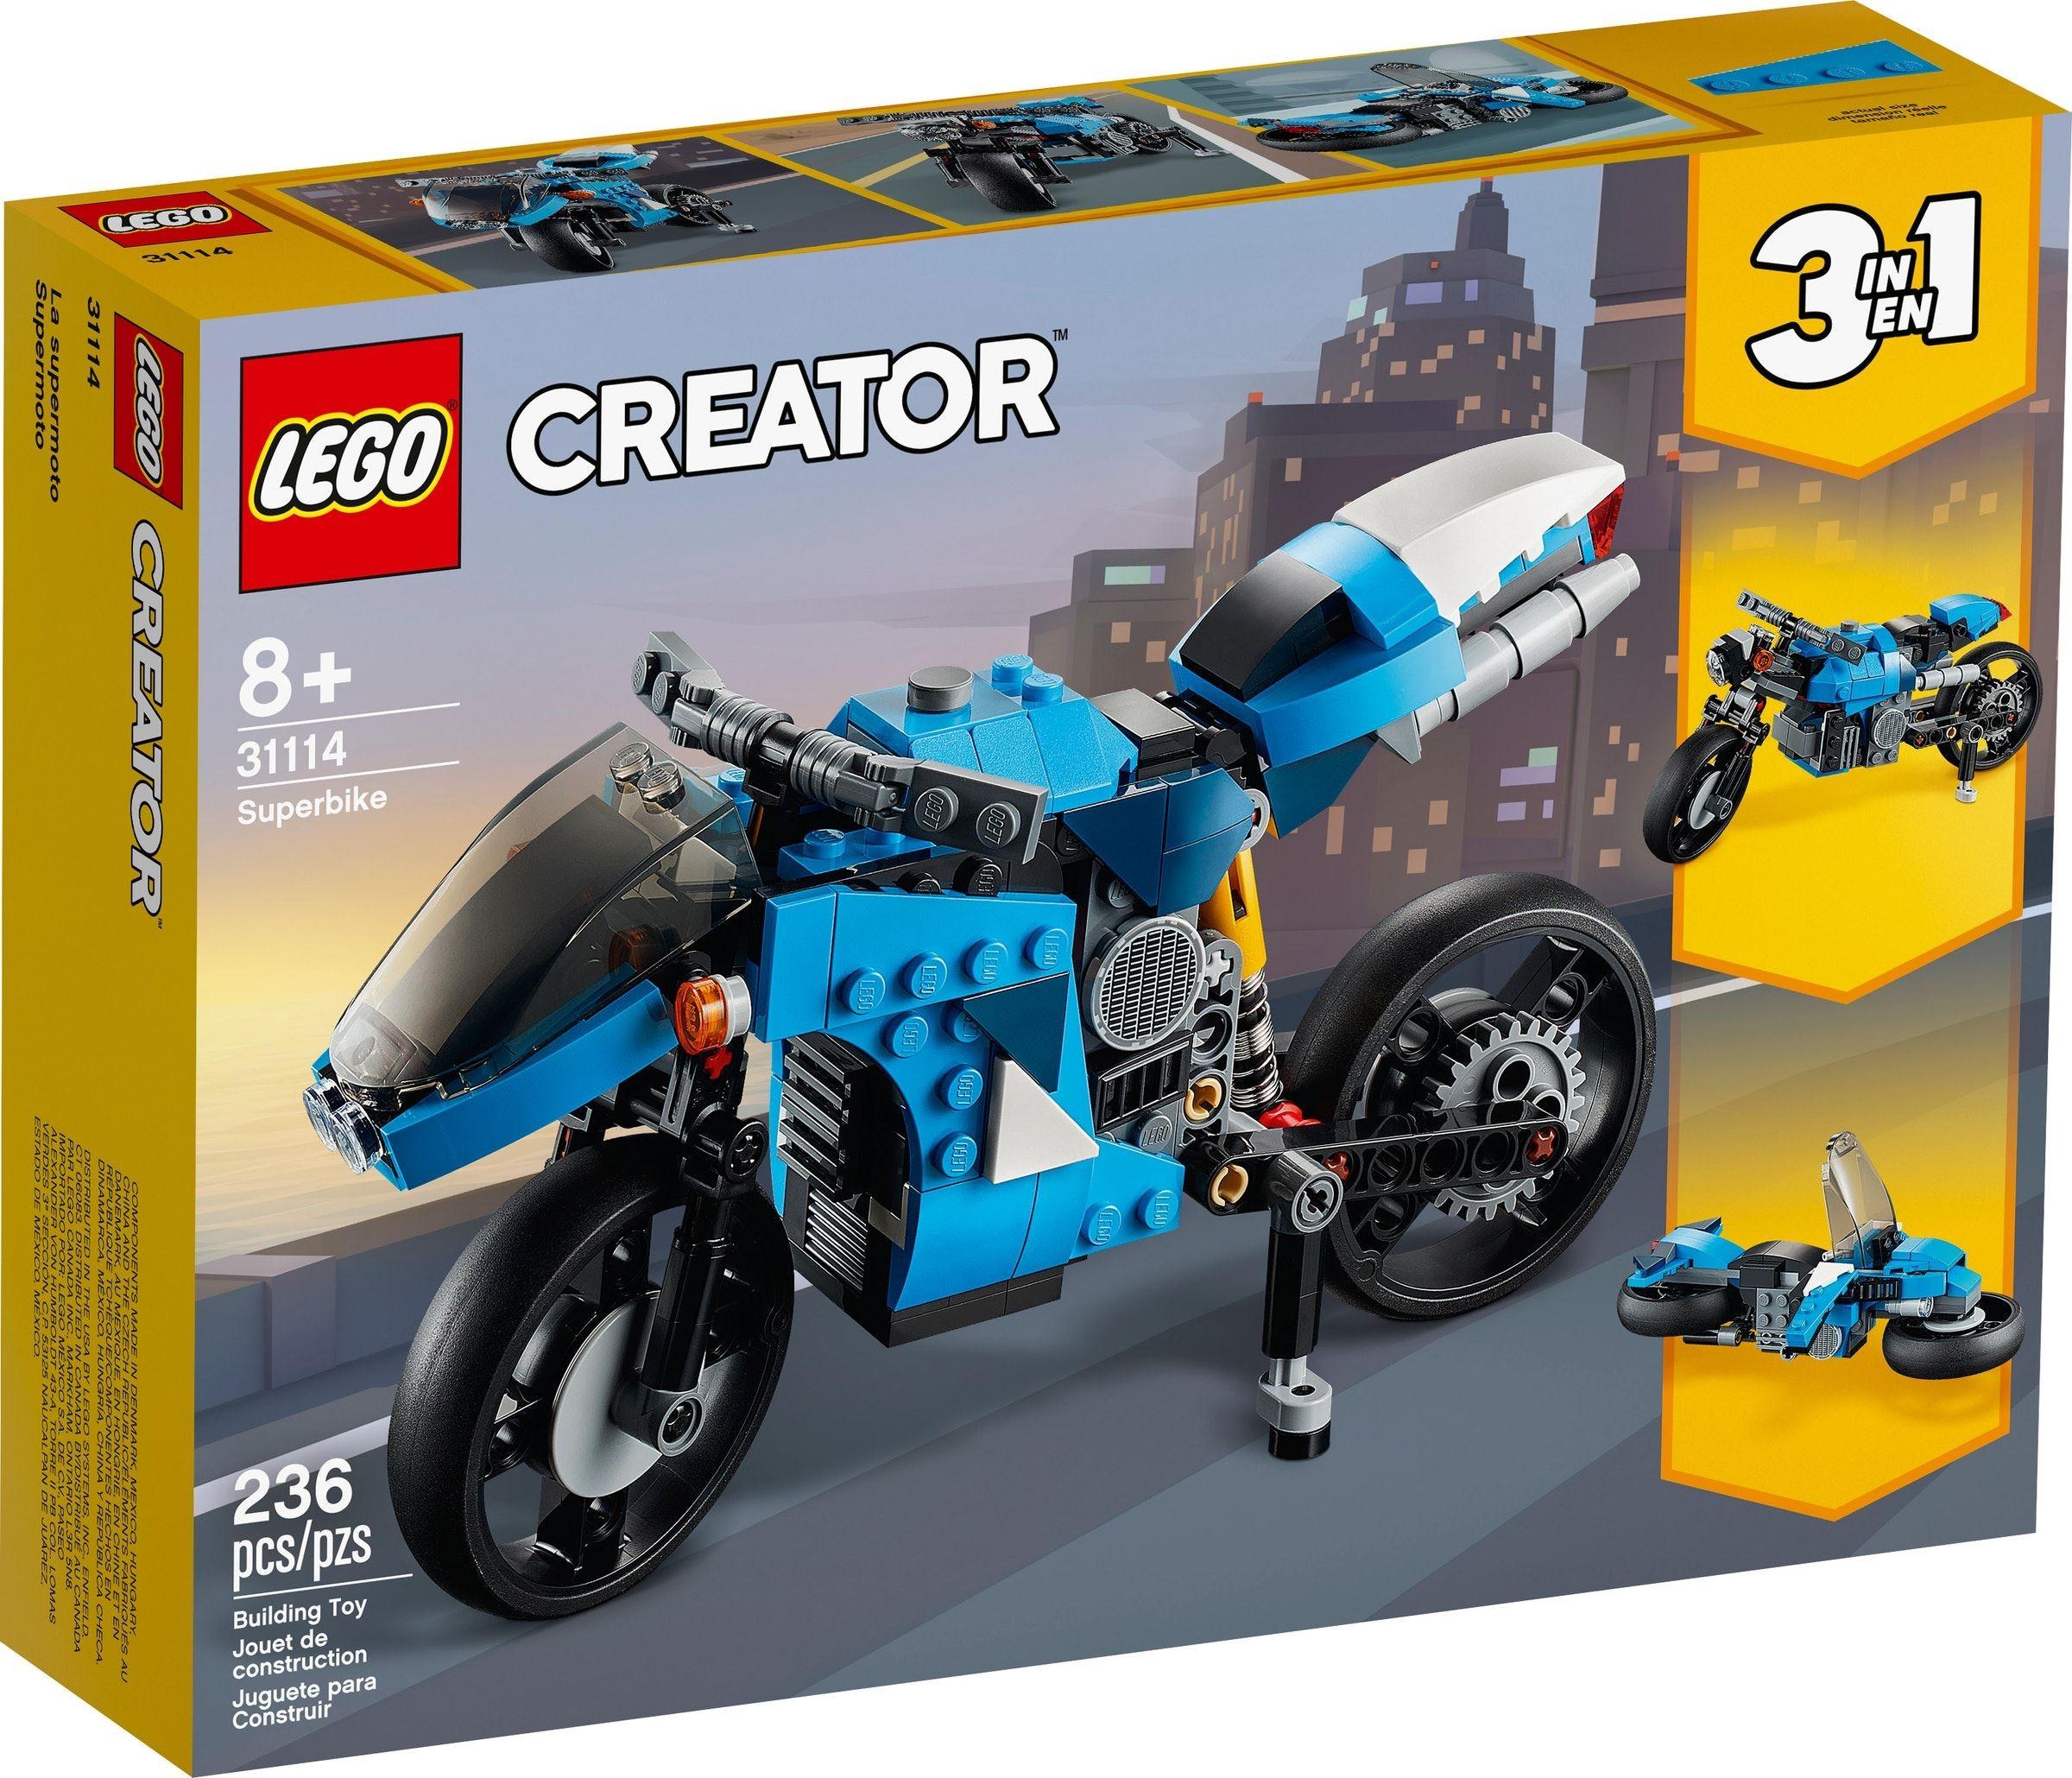 LEGO Creator - Superbike (31114)